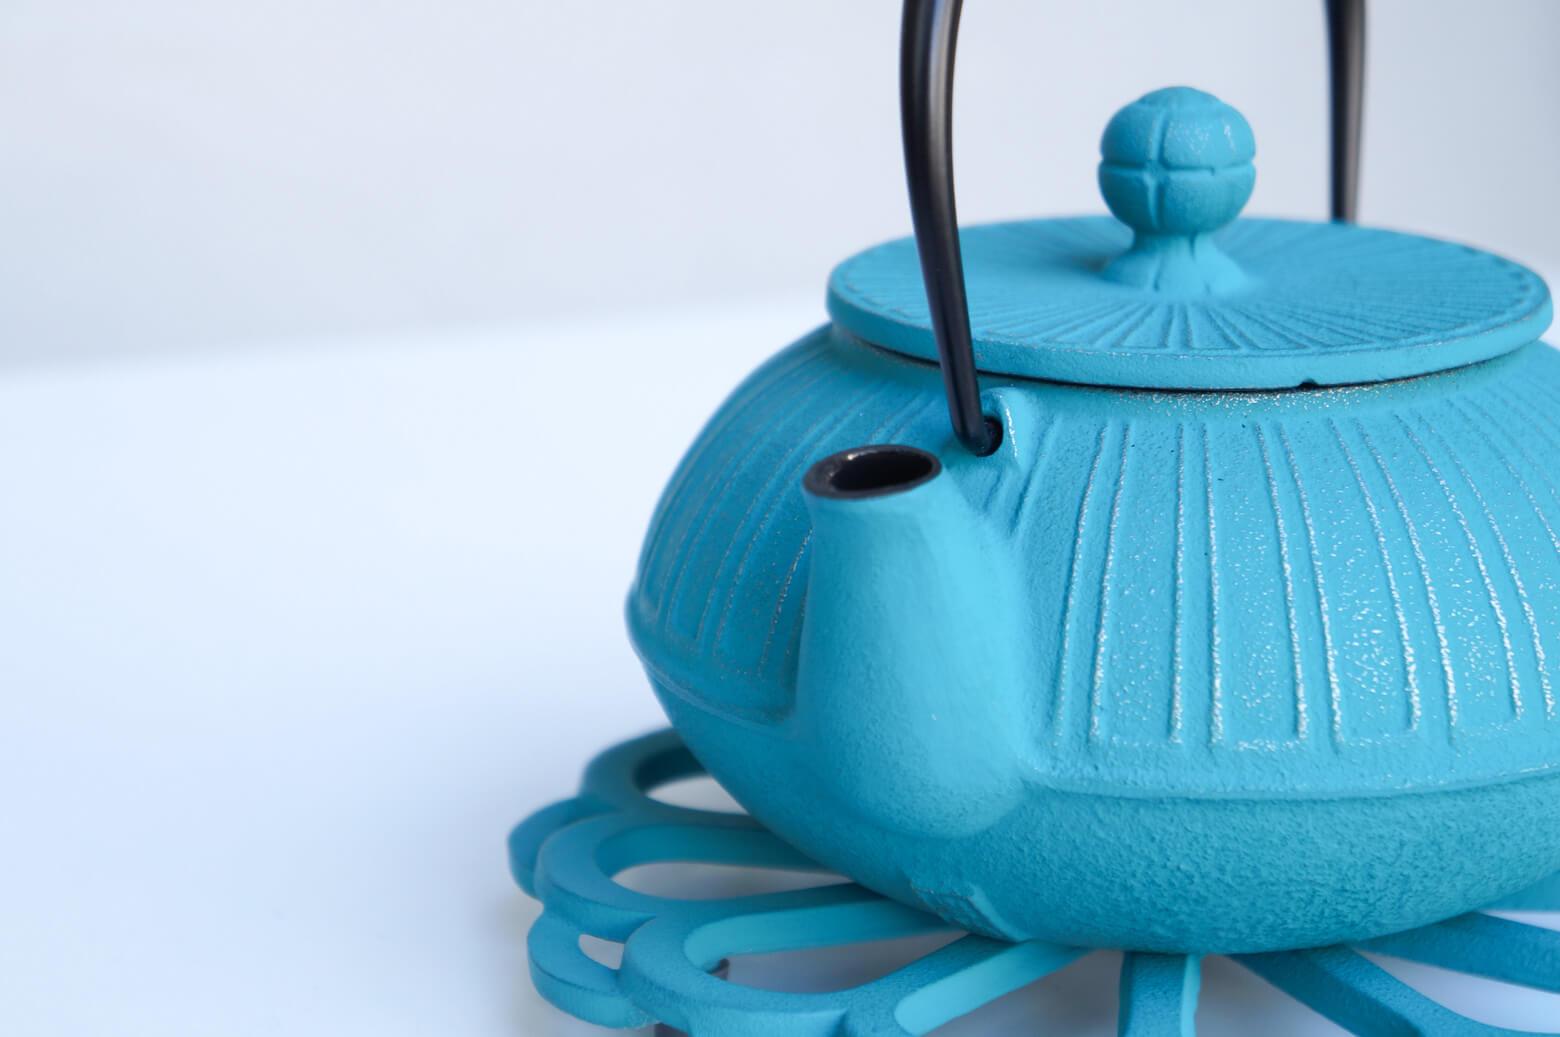 Enchan Thé Théière En Fonte Socles En Fonte Kiku No.5 Turquoise/アンシャンテ 南部鉄器 カラーポットセット キク ターコイズ